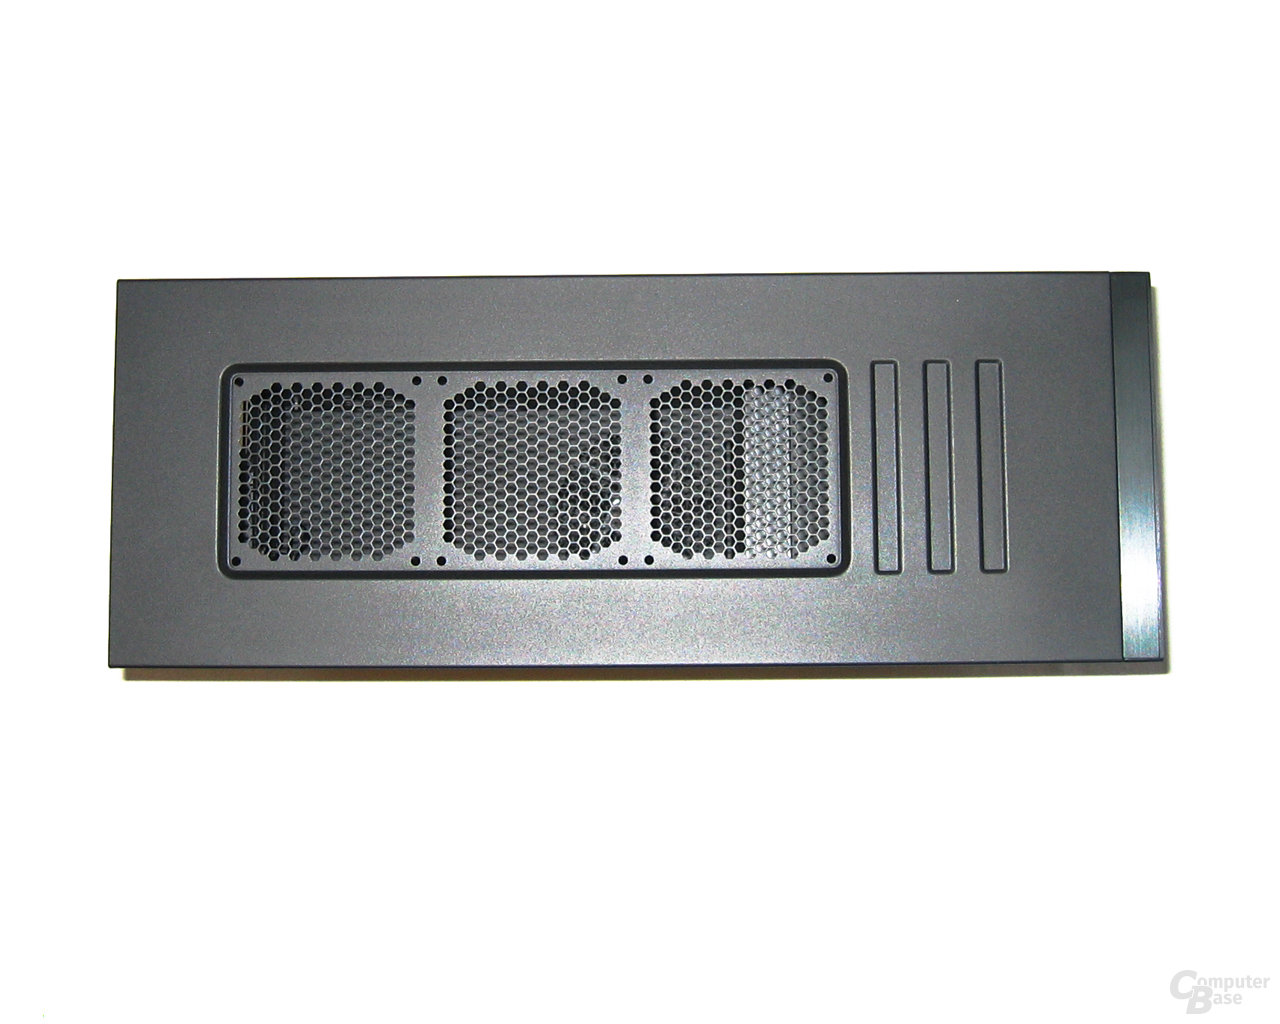 Corsair Obsidian 800D – Deckel